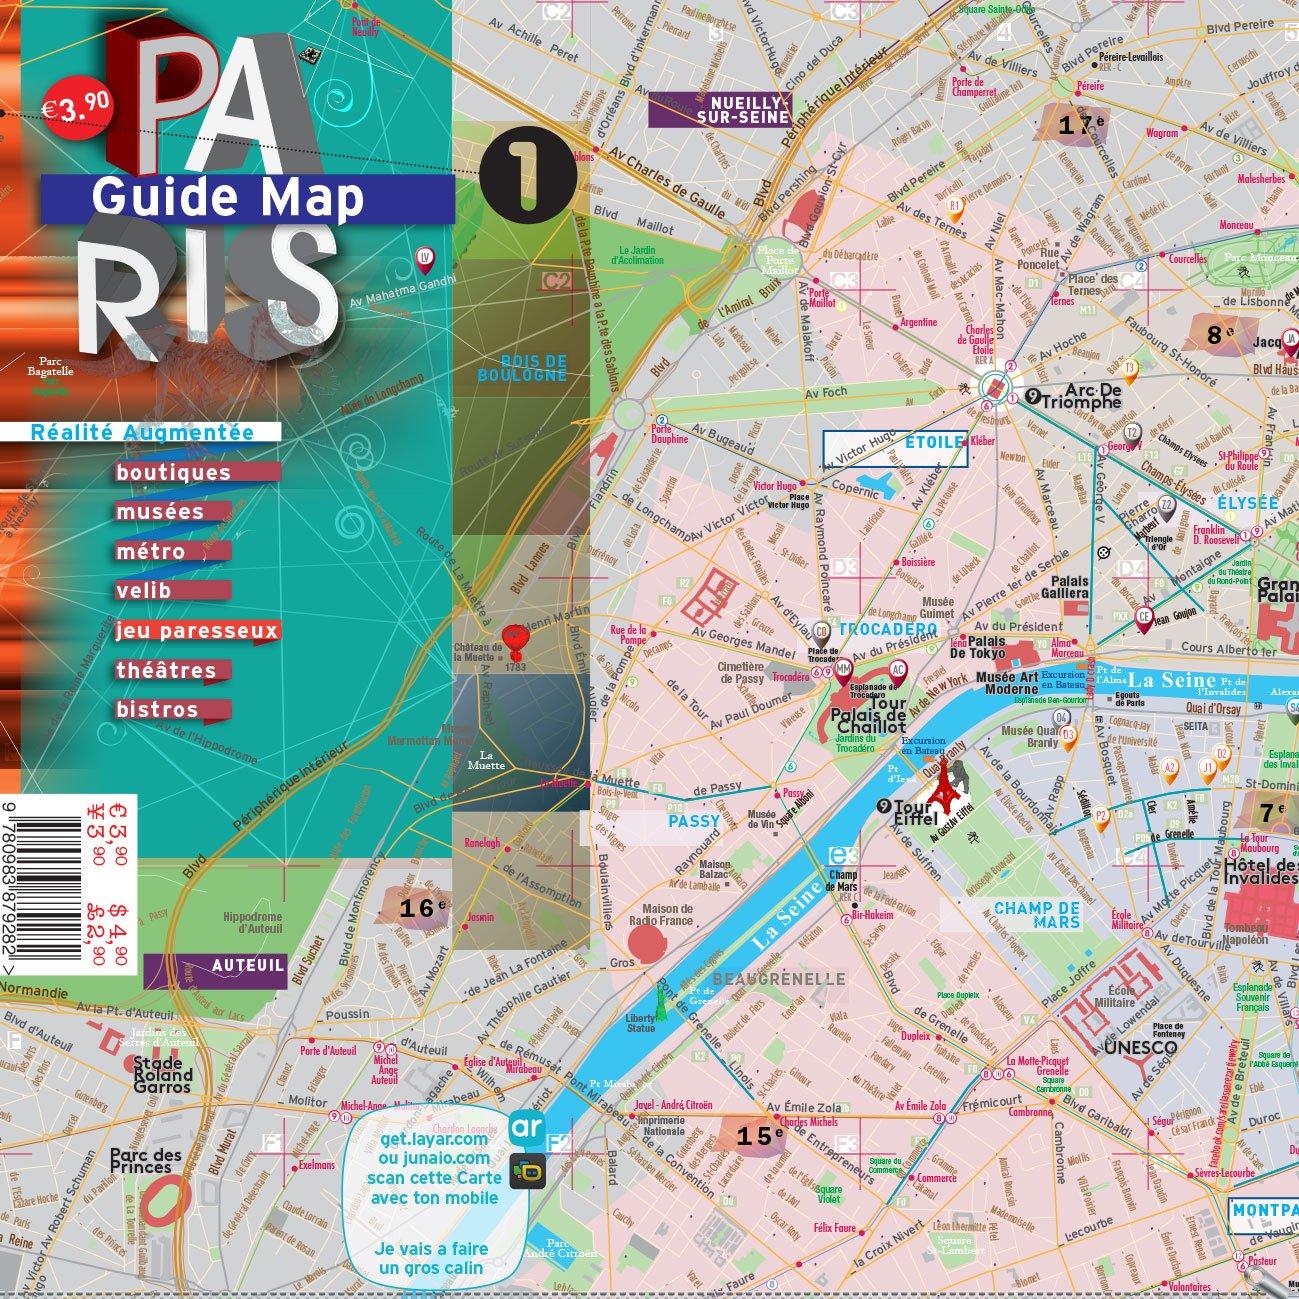 Cartina Parigi Con Monumenti E Metro.Amazon It Paris Mappa Laminata Strade Musei Metro Bistrot Terramaps Alberto Michieli Anuradha Mohan Bruna Merlo Libri